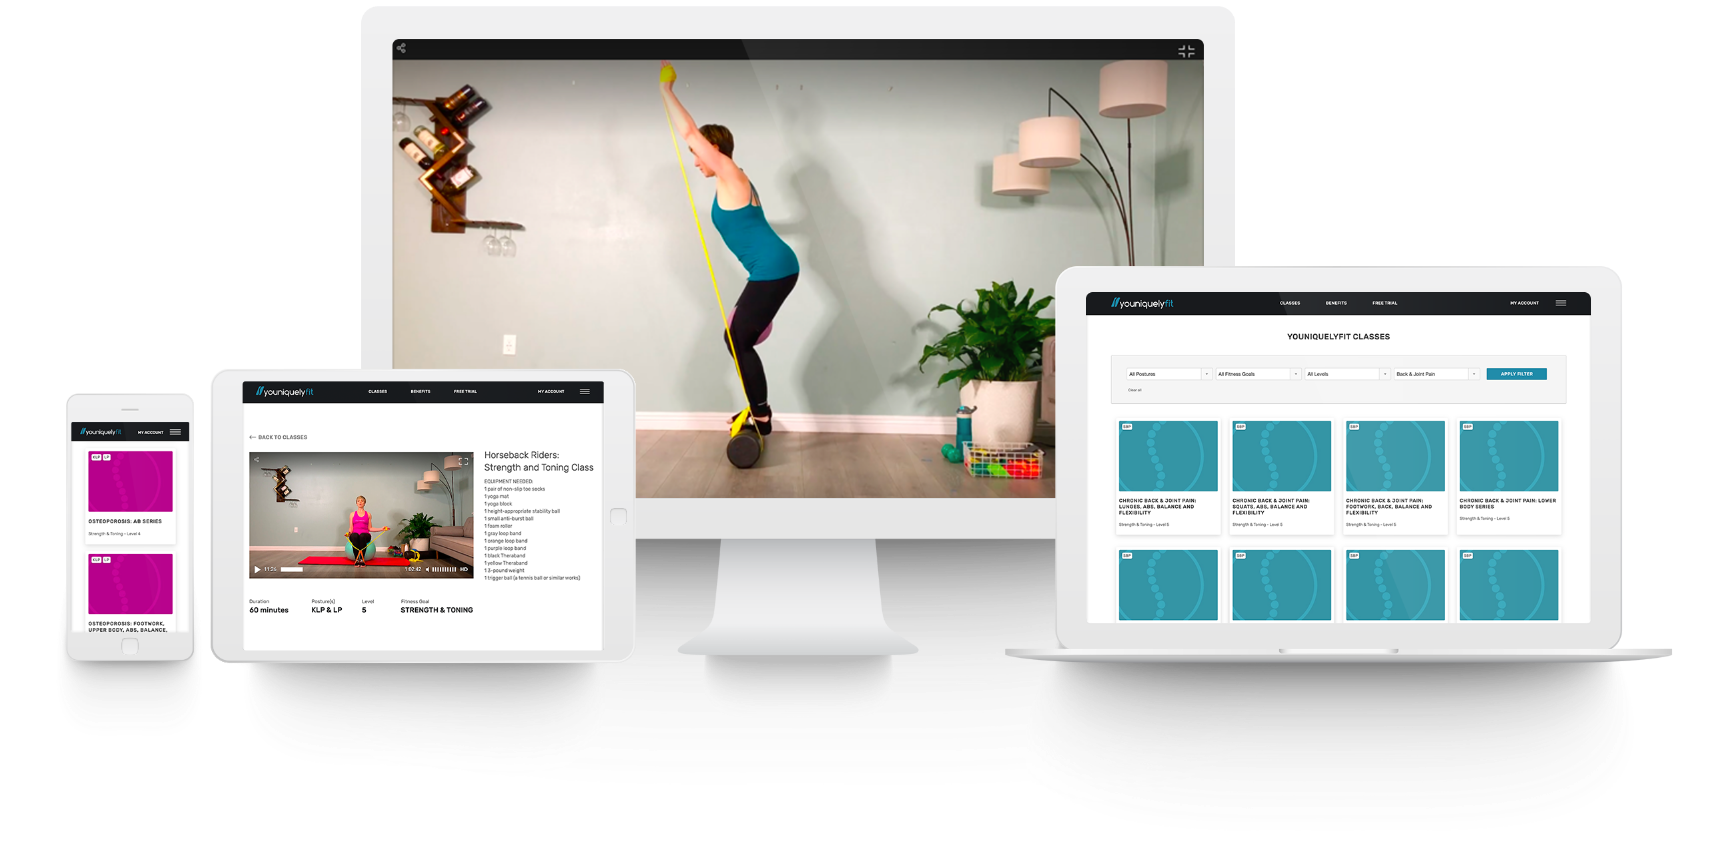 YouniquelyFit-Posture-Fitness-Mobile-OTT-App-Mockup-2